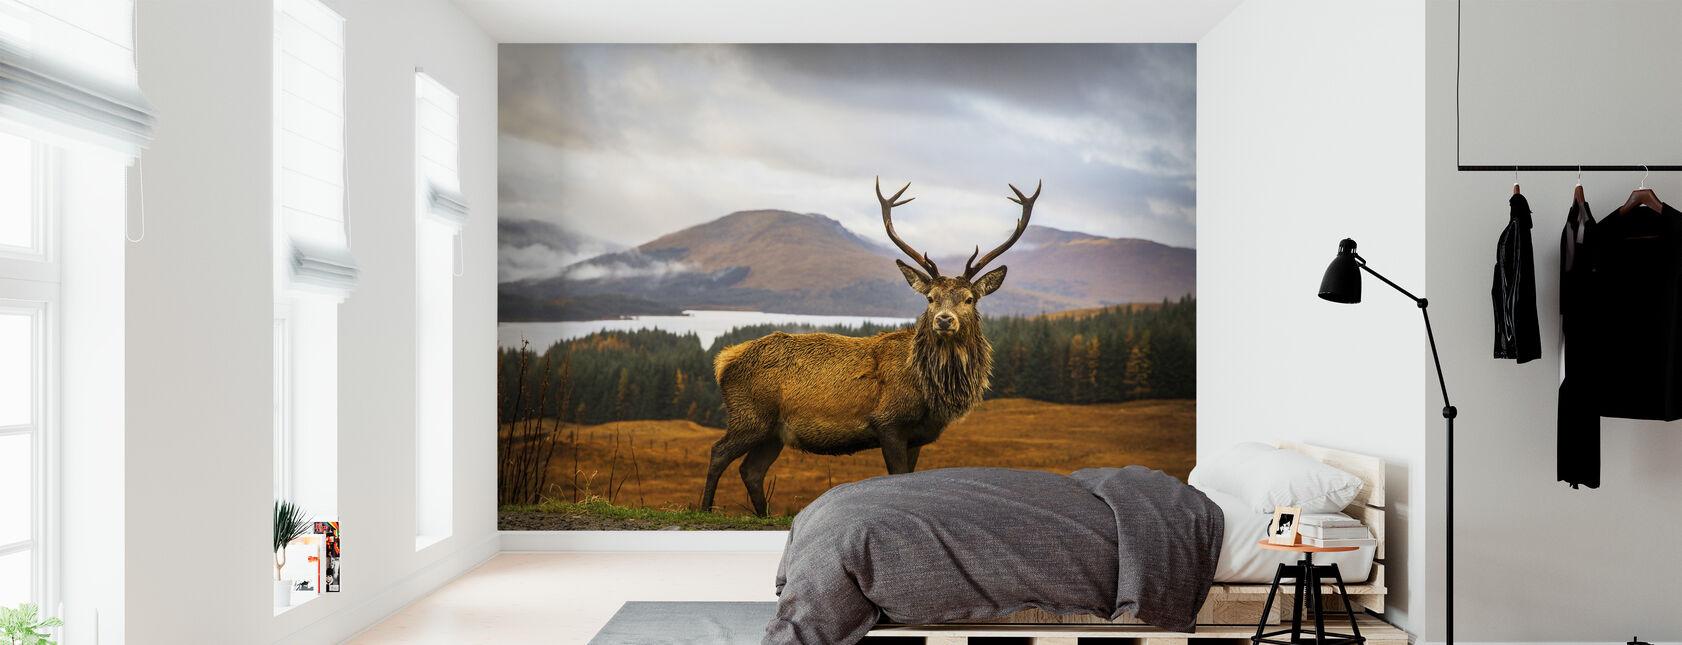 Scottish Stag - Wallpaper - Bedroom